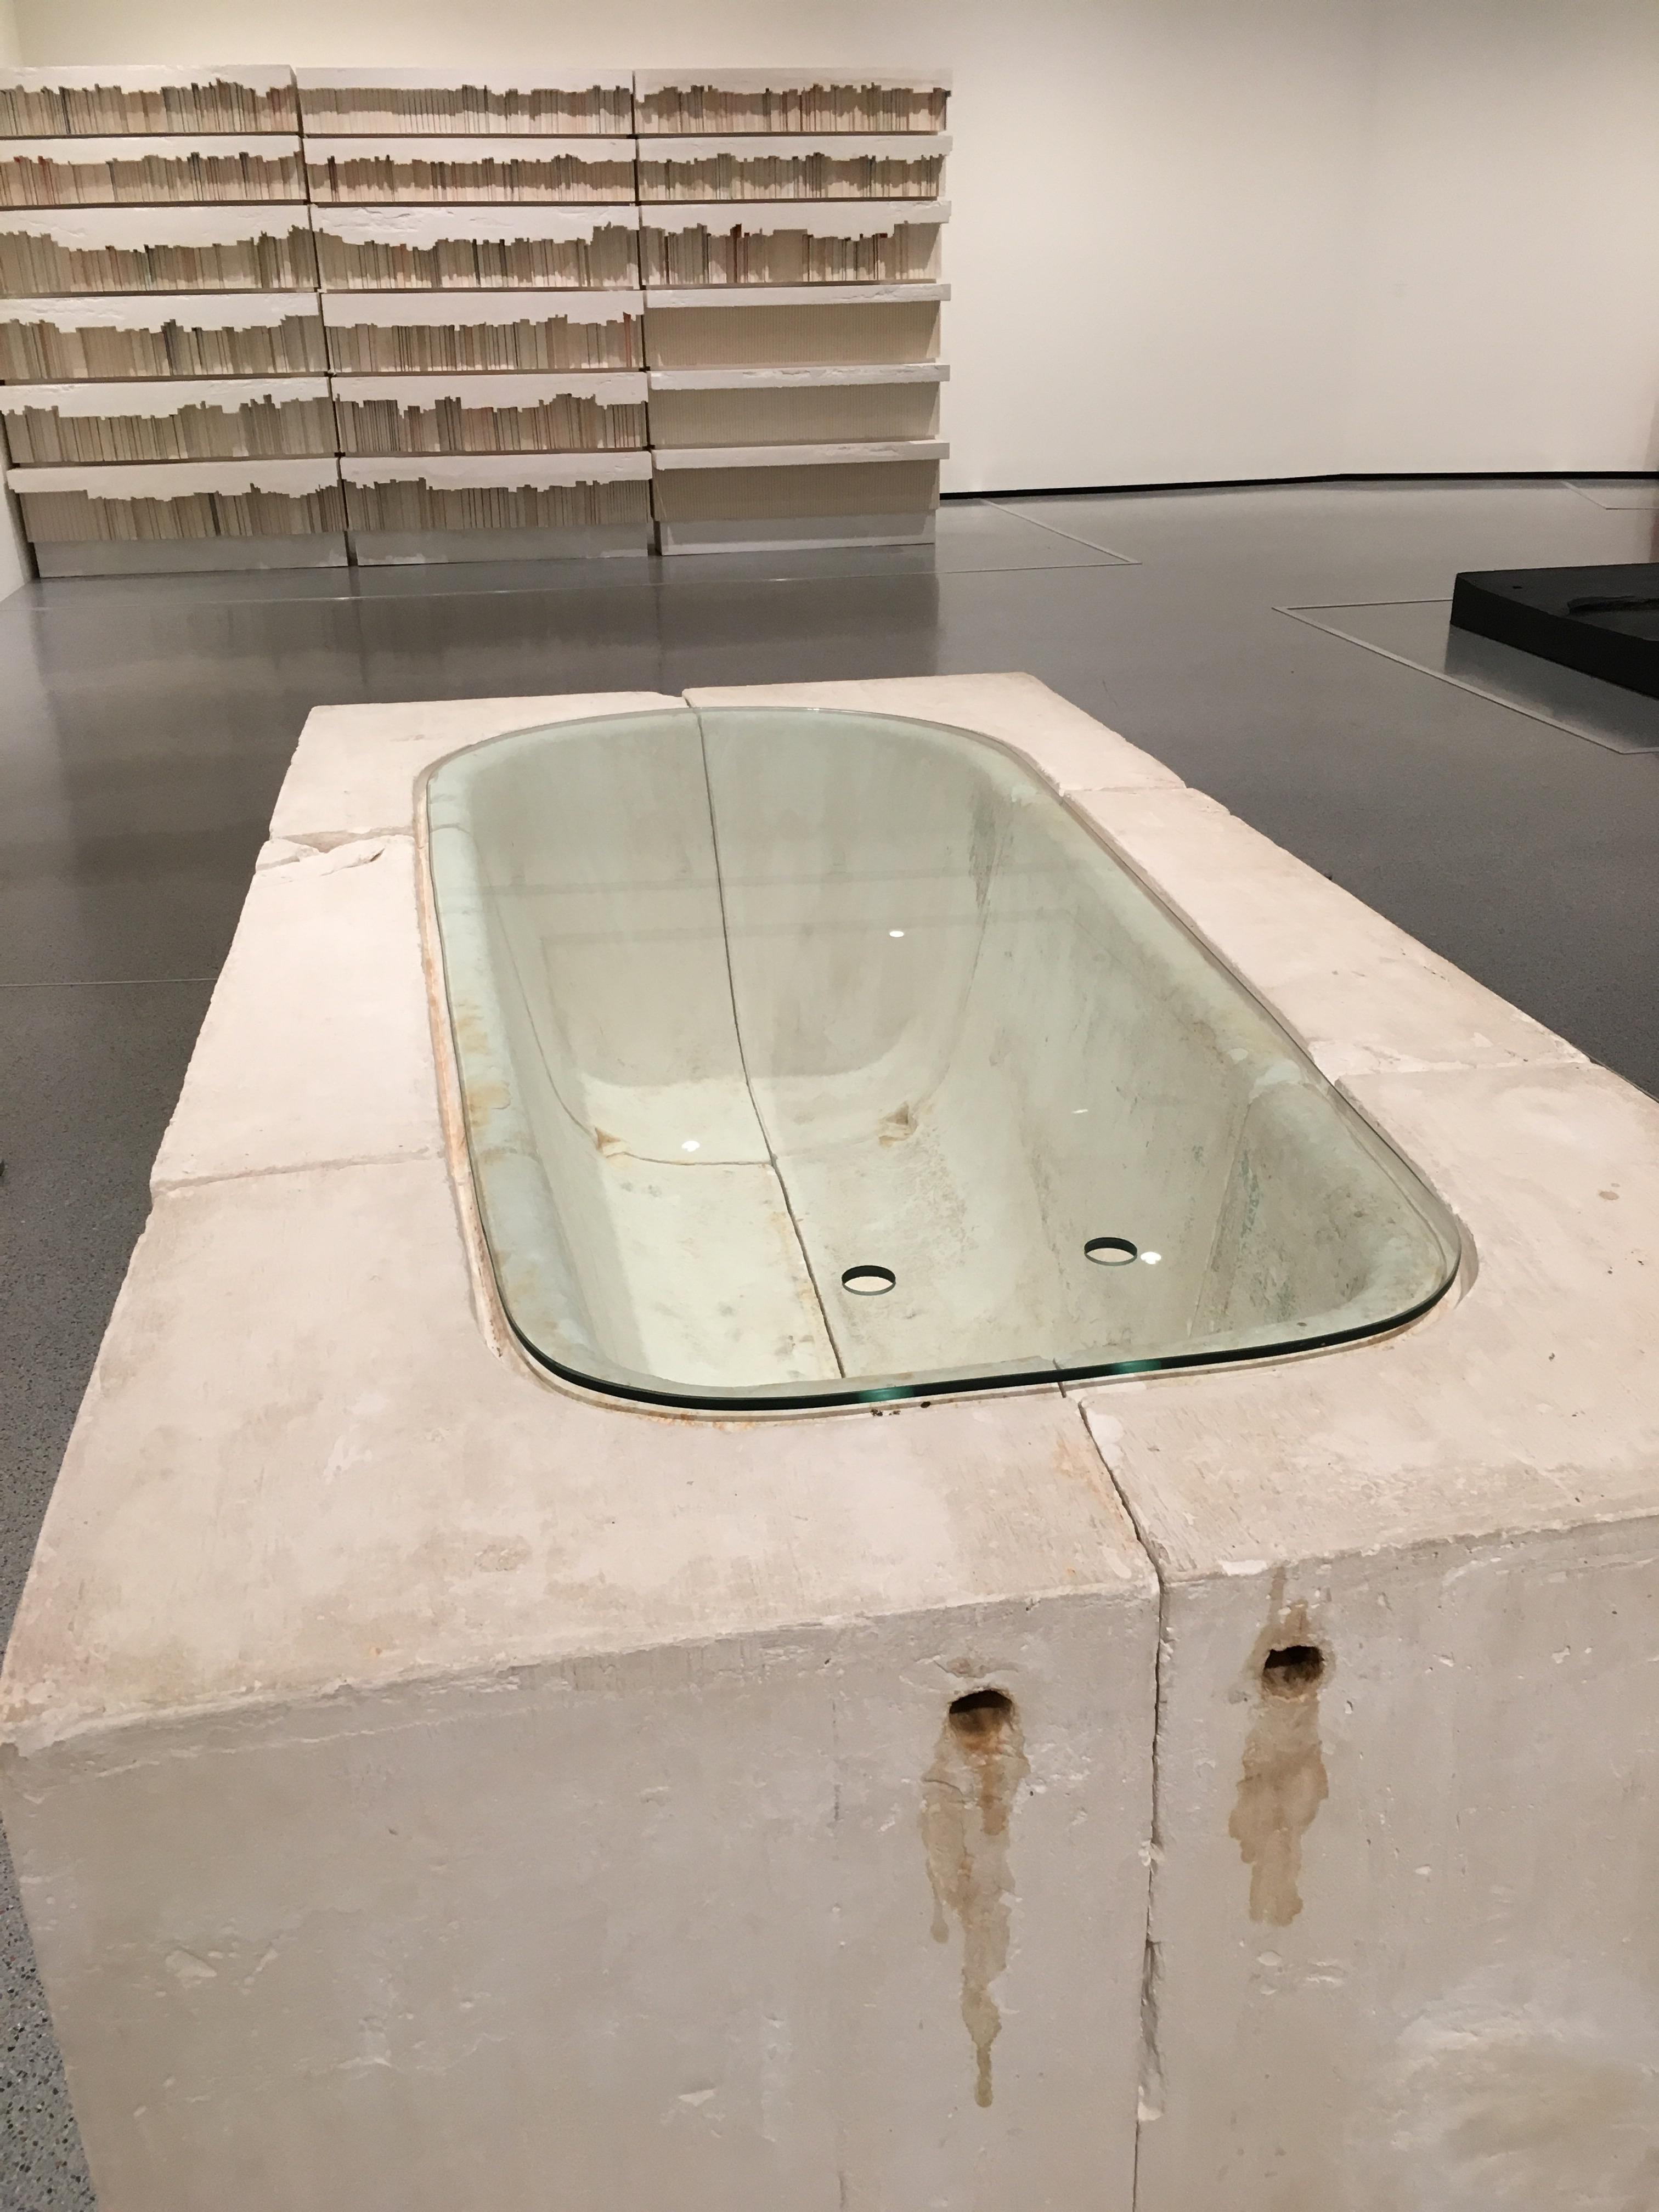 Untitled Bath, 1990, Rachel Whiteread